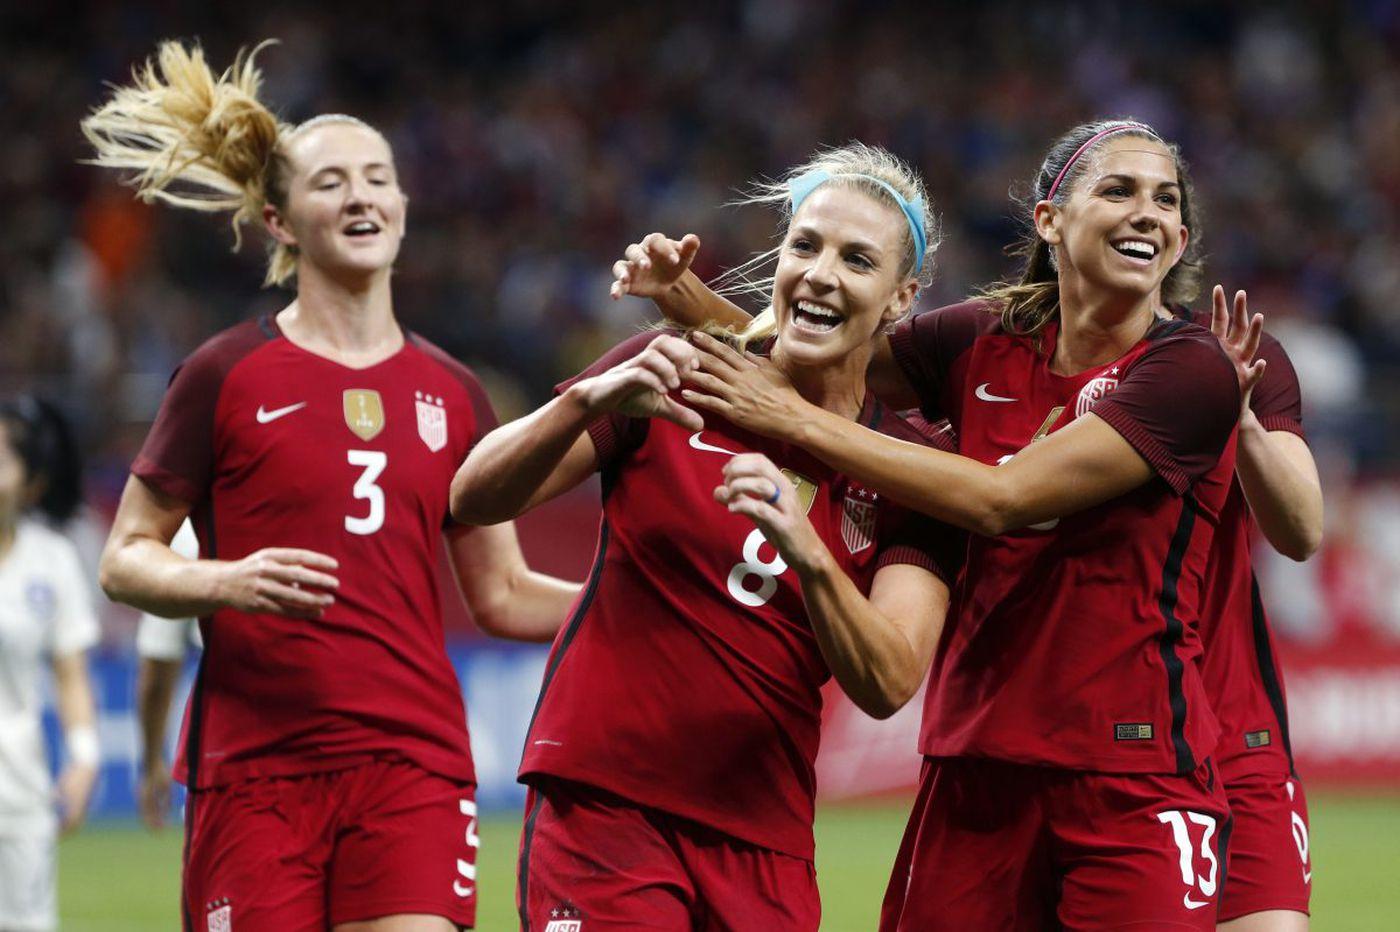 Julie Ertz named U.S. women's national team player of the year